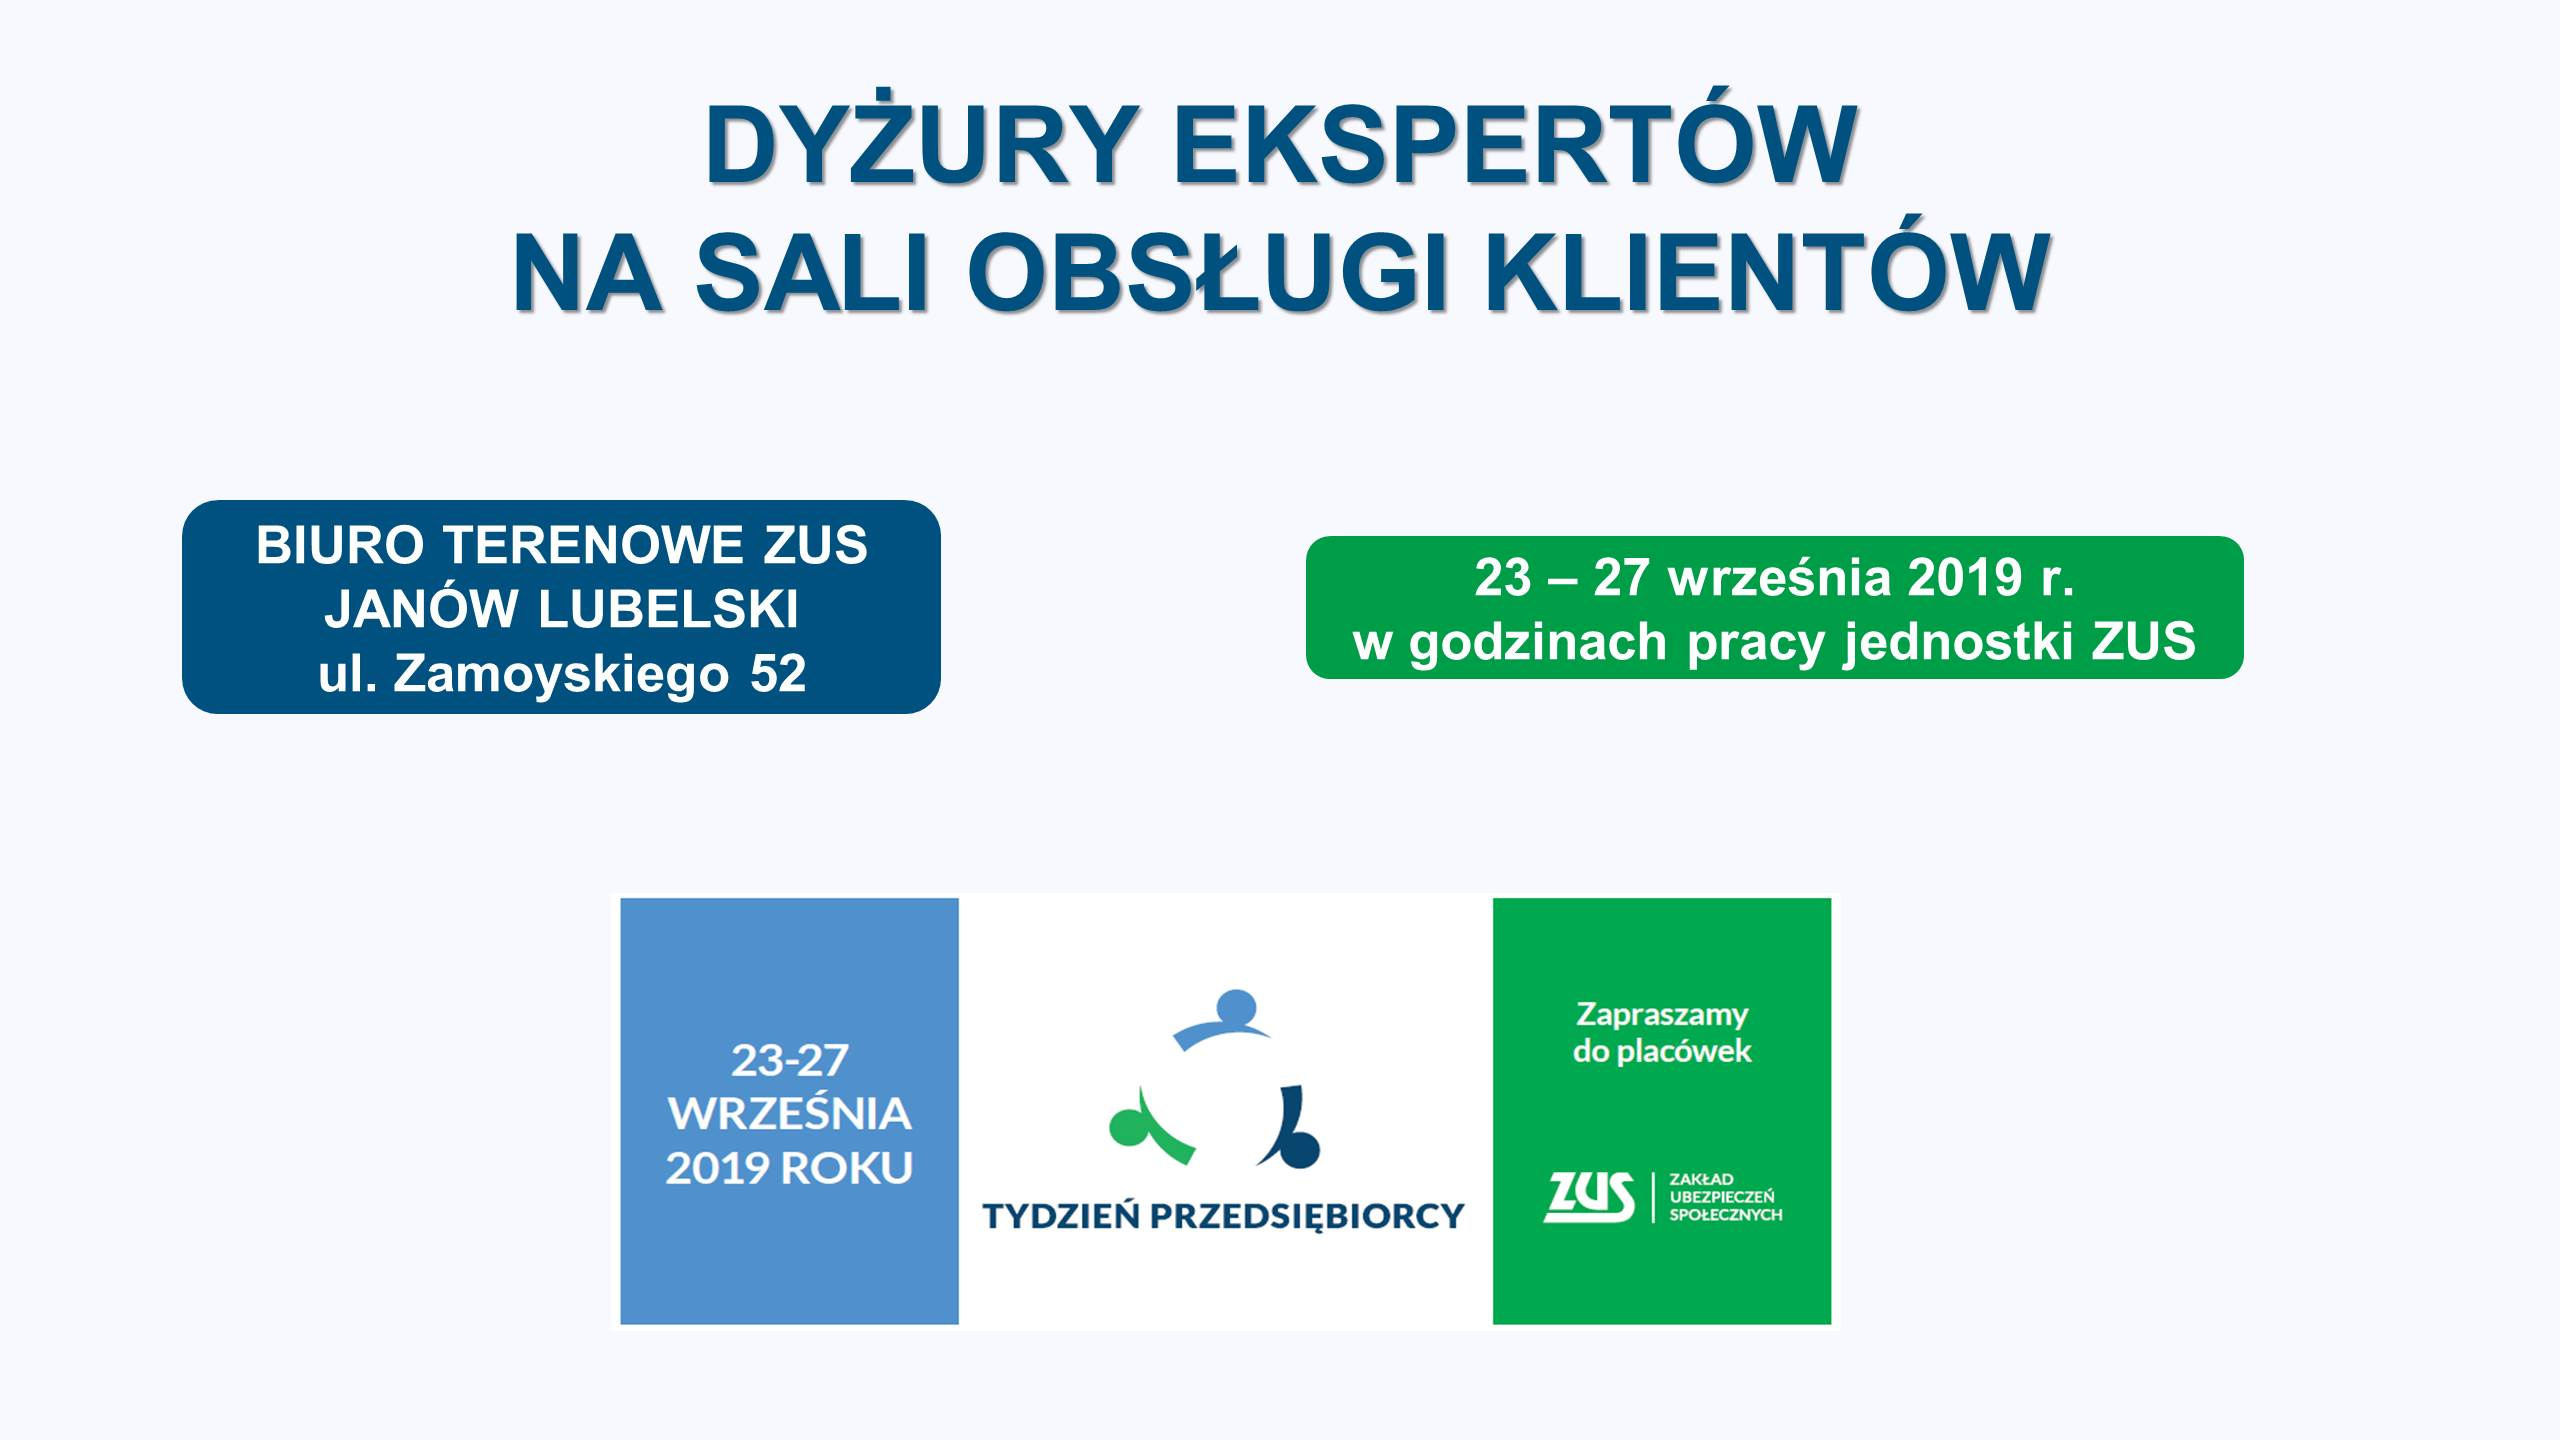 https://modliborzyce.pl/images/aktualnosci/2019/09WRZESIEN/4_TP-Janw-Lubelski.JPG